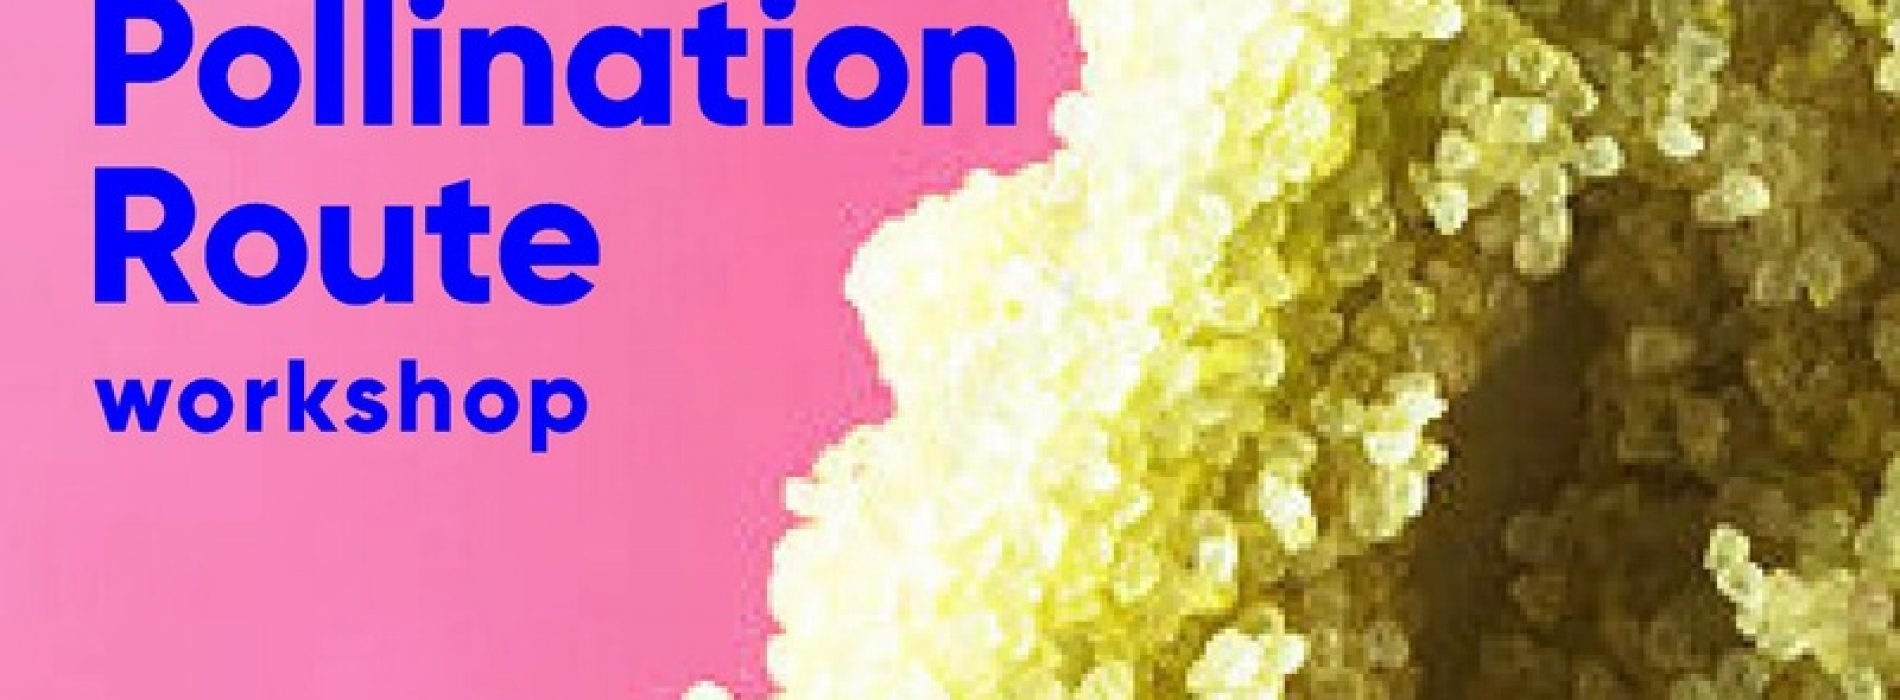 Pollination Route Workshop at Diaspore